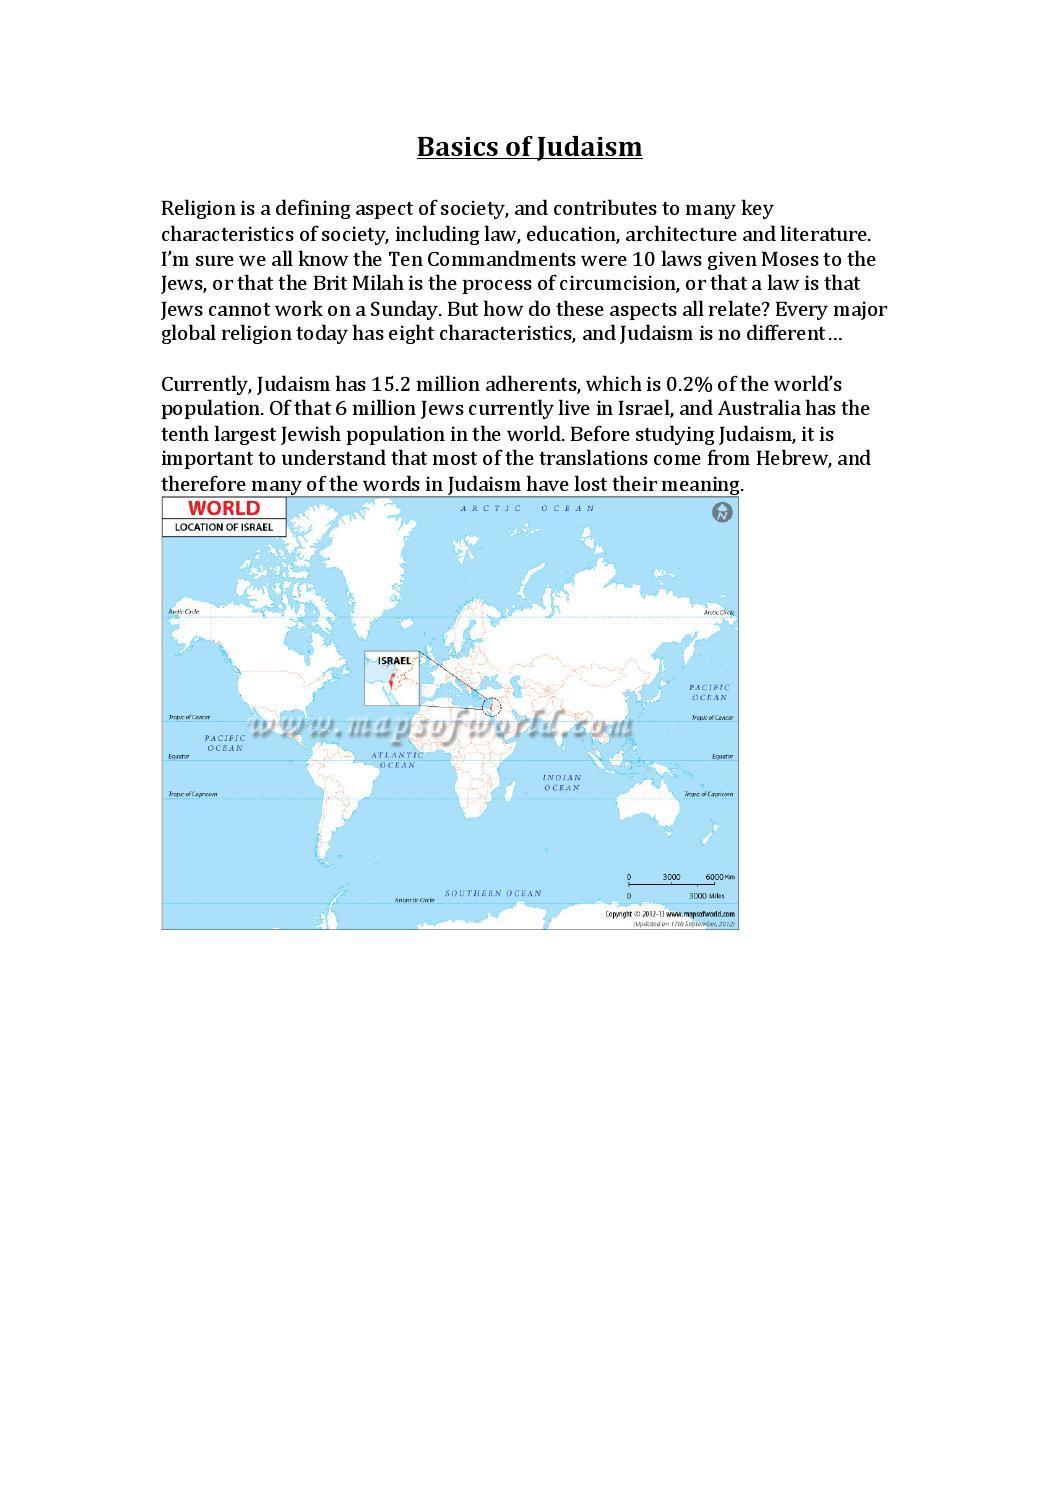 Basics of judaism pdf version by Lukeg_35 - issuu